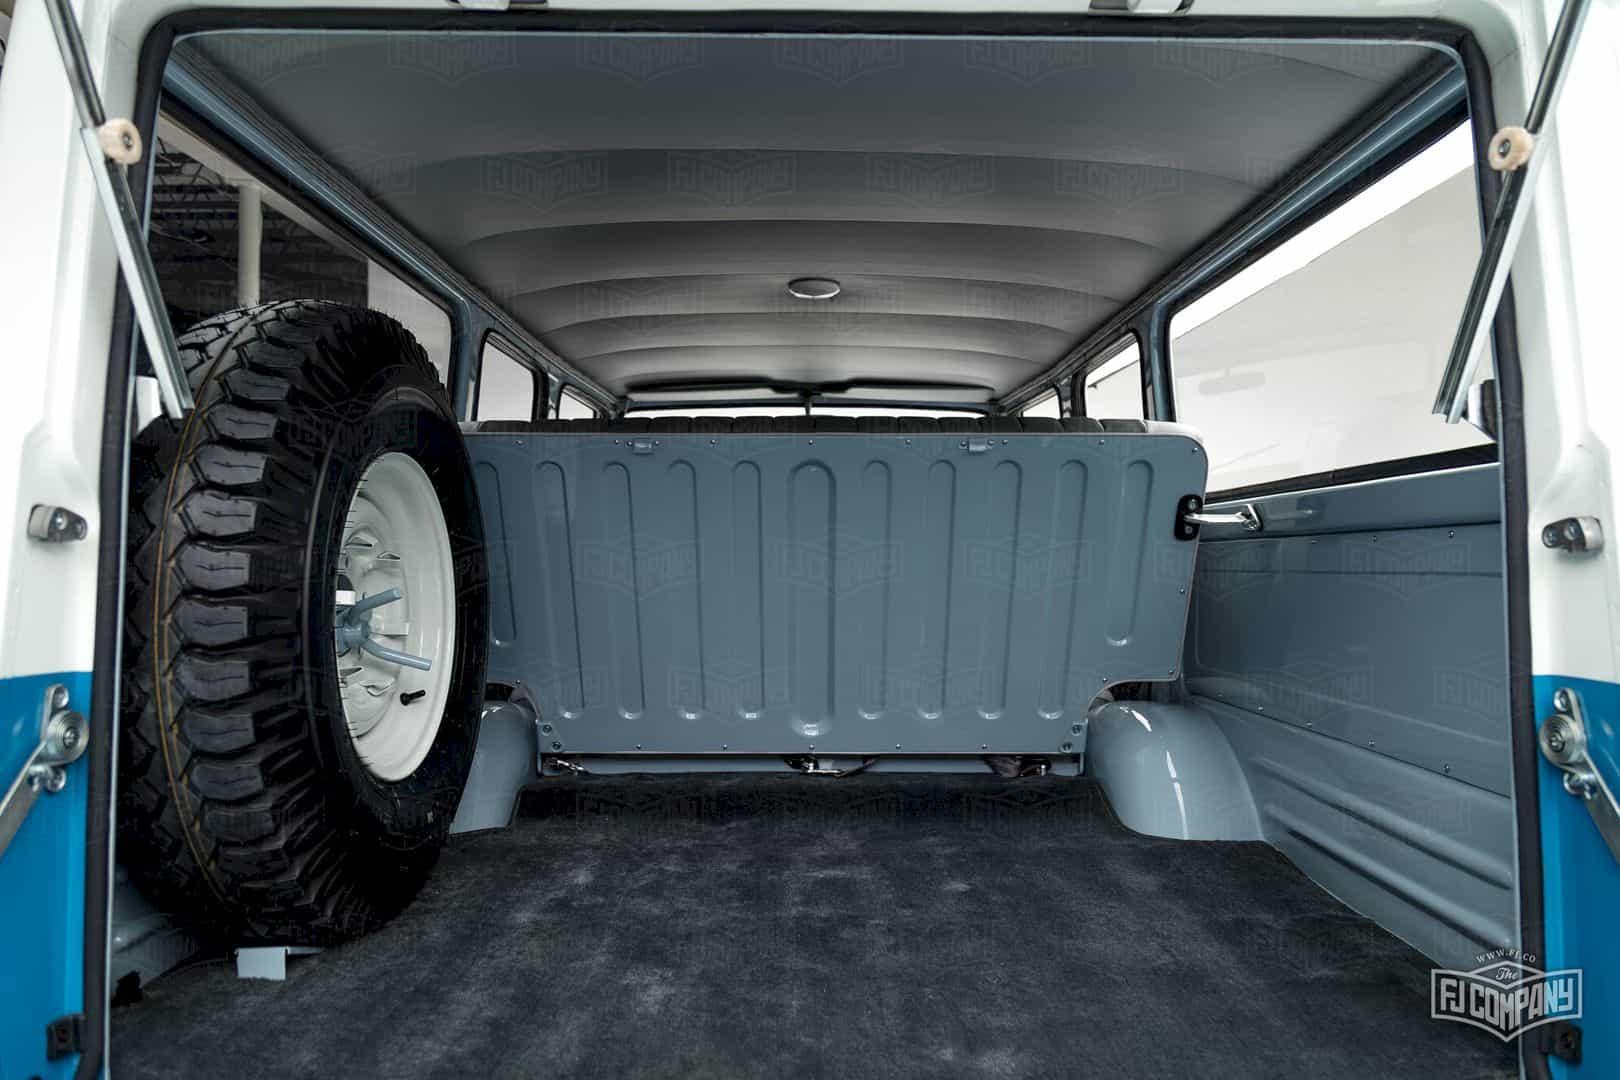 1967 Toyota Land Cruiser Fj45lv Capri Blue 3